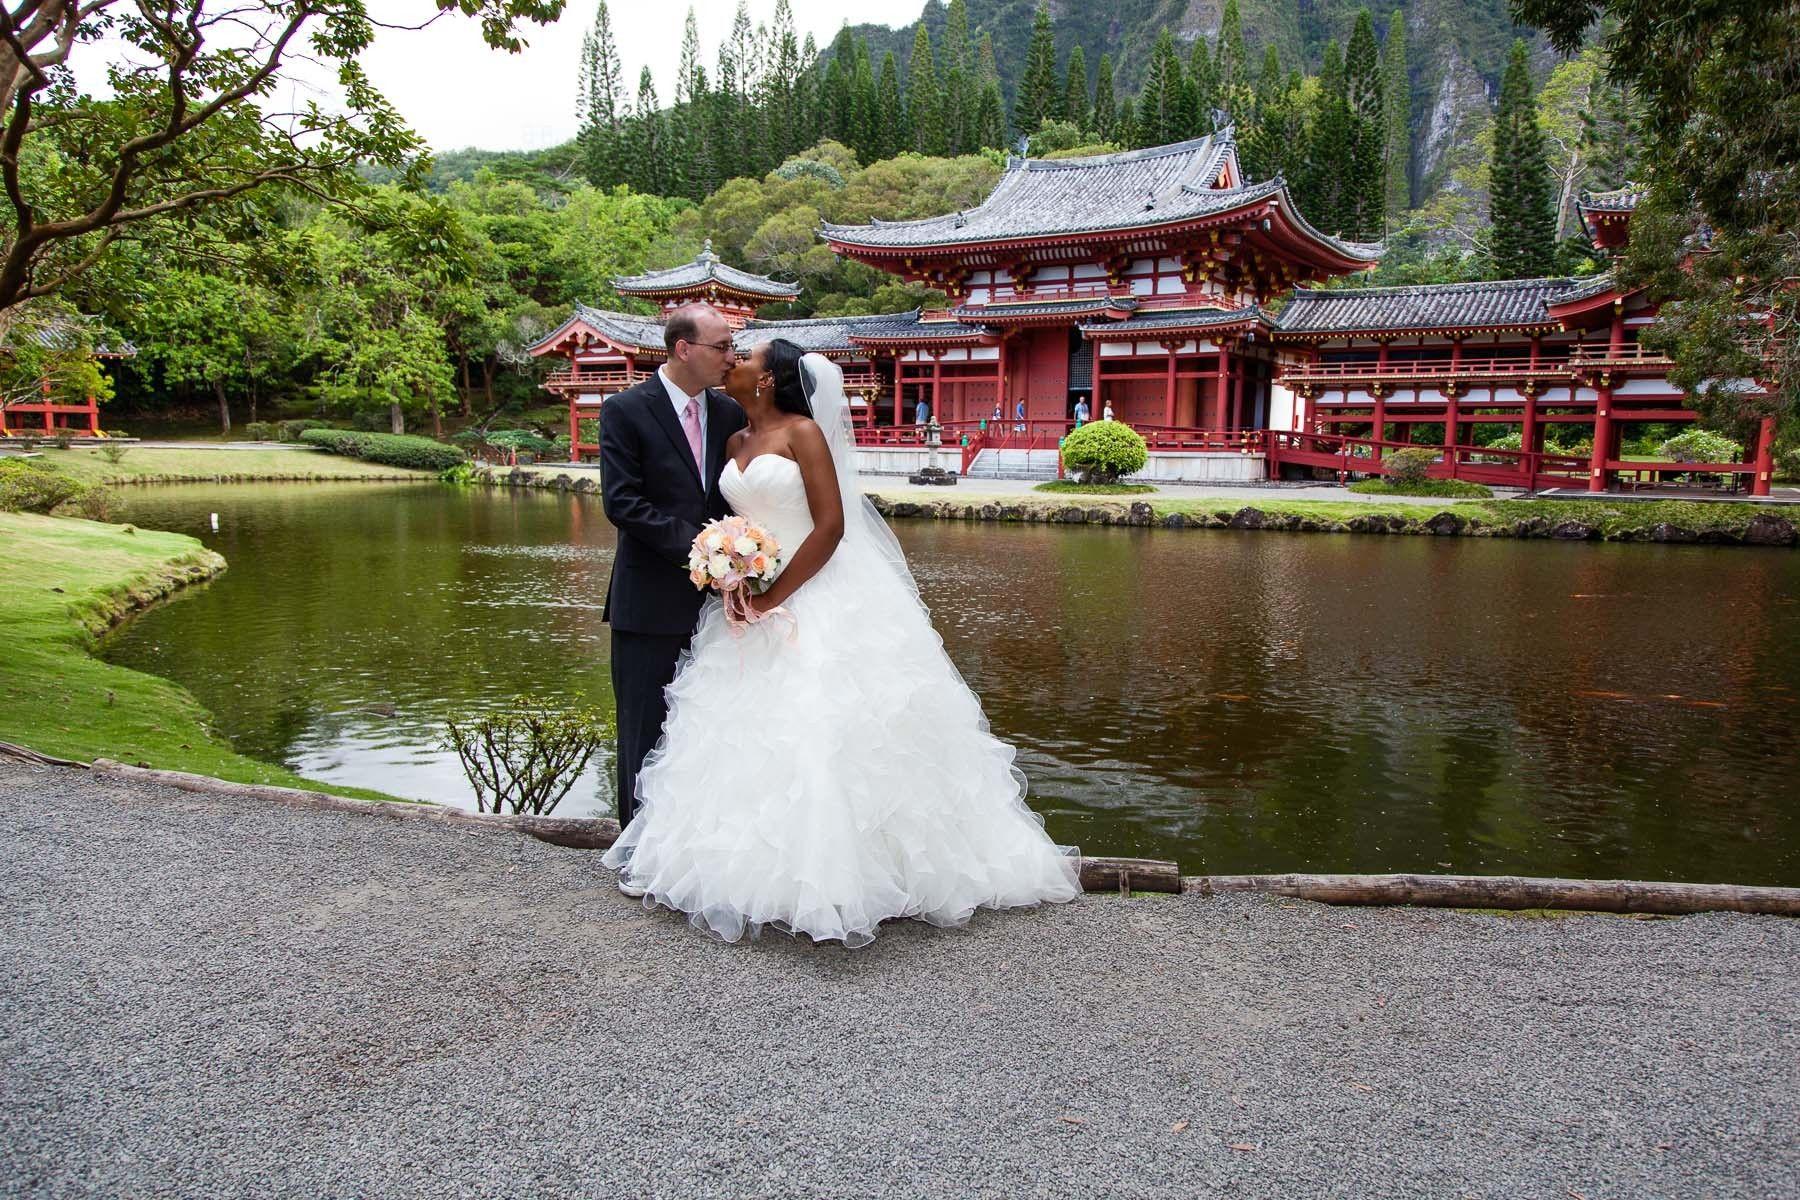 195_1kailua_kona__honolulu__hawaii__wedding__photographer_1245.jpg